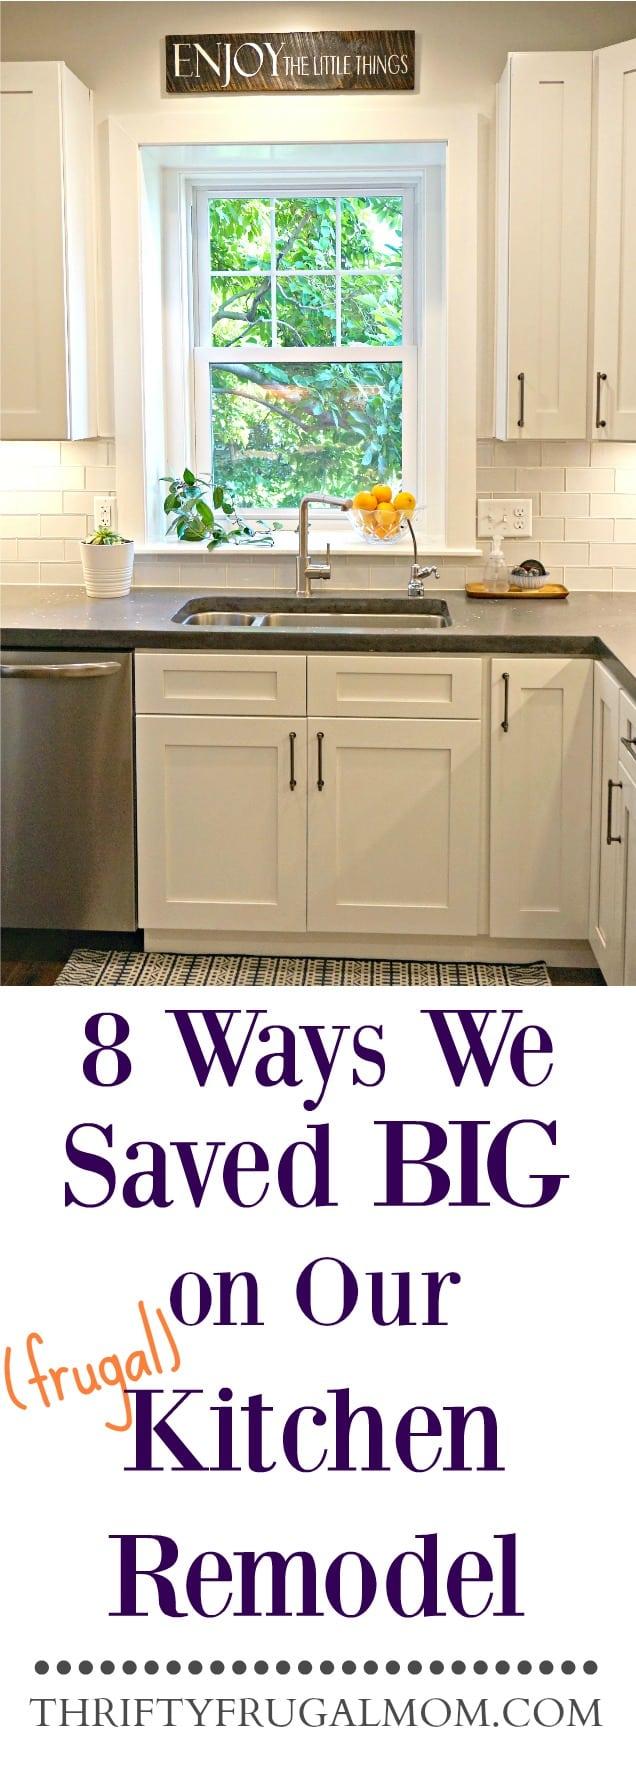 Frugal Kitchen Remodel- ways we saved